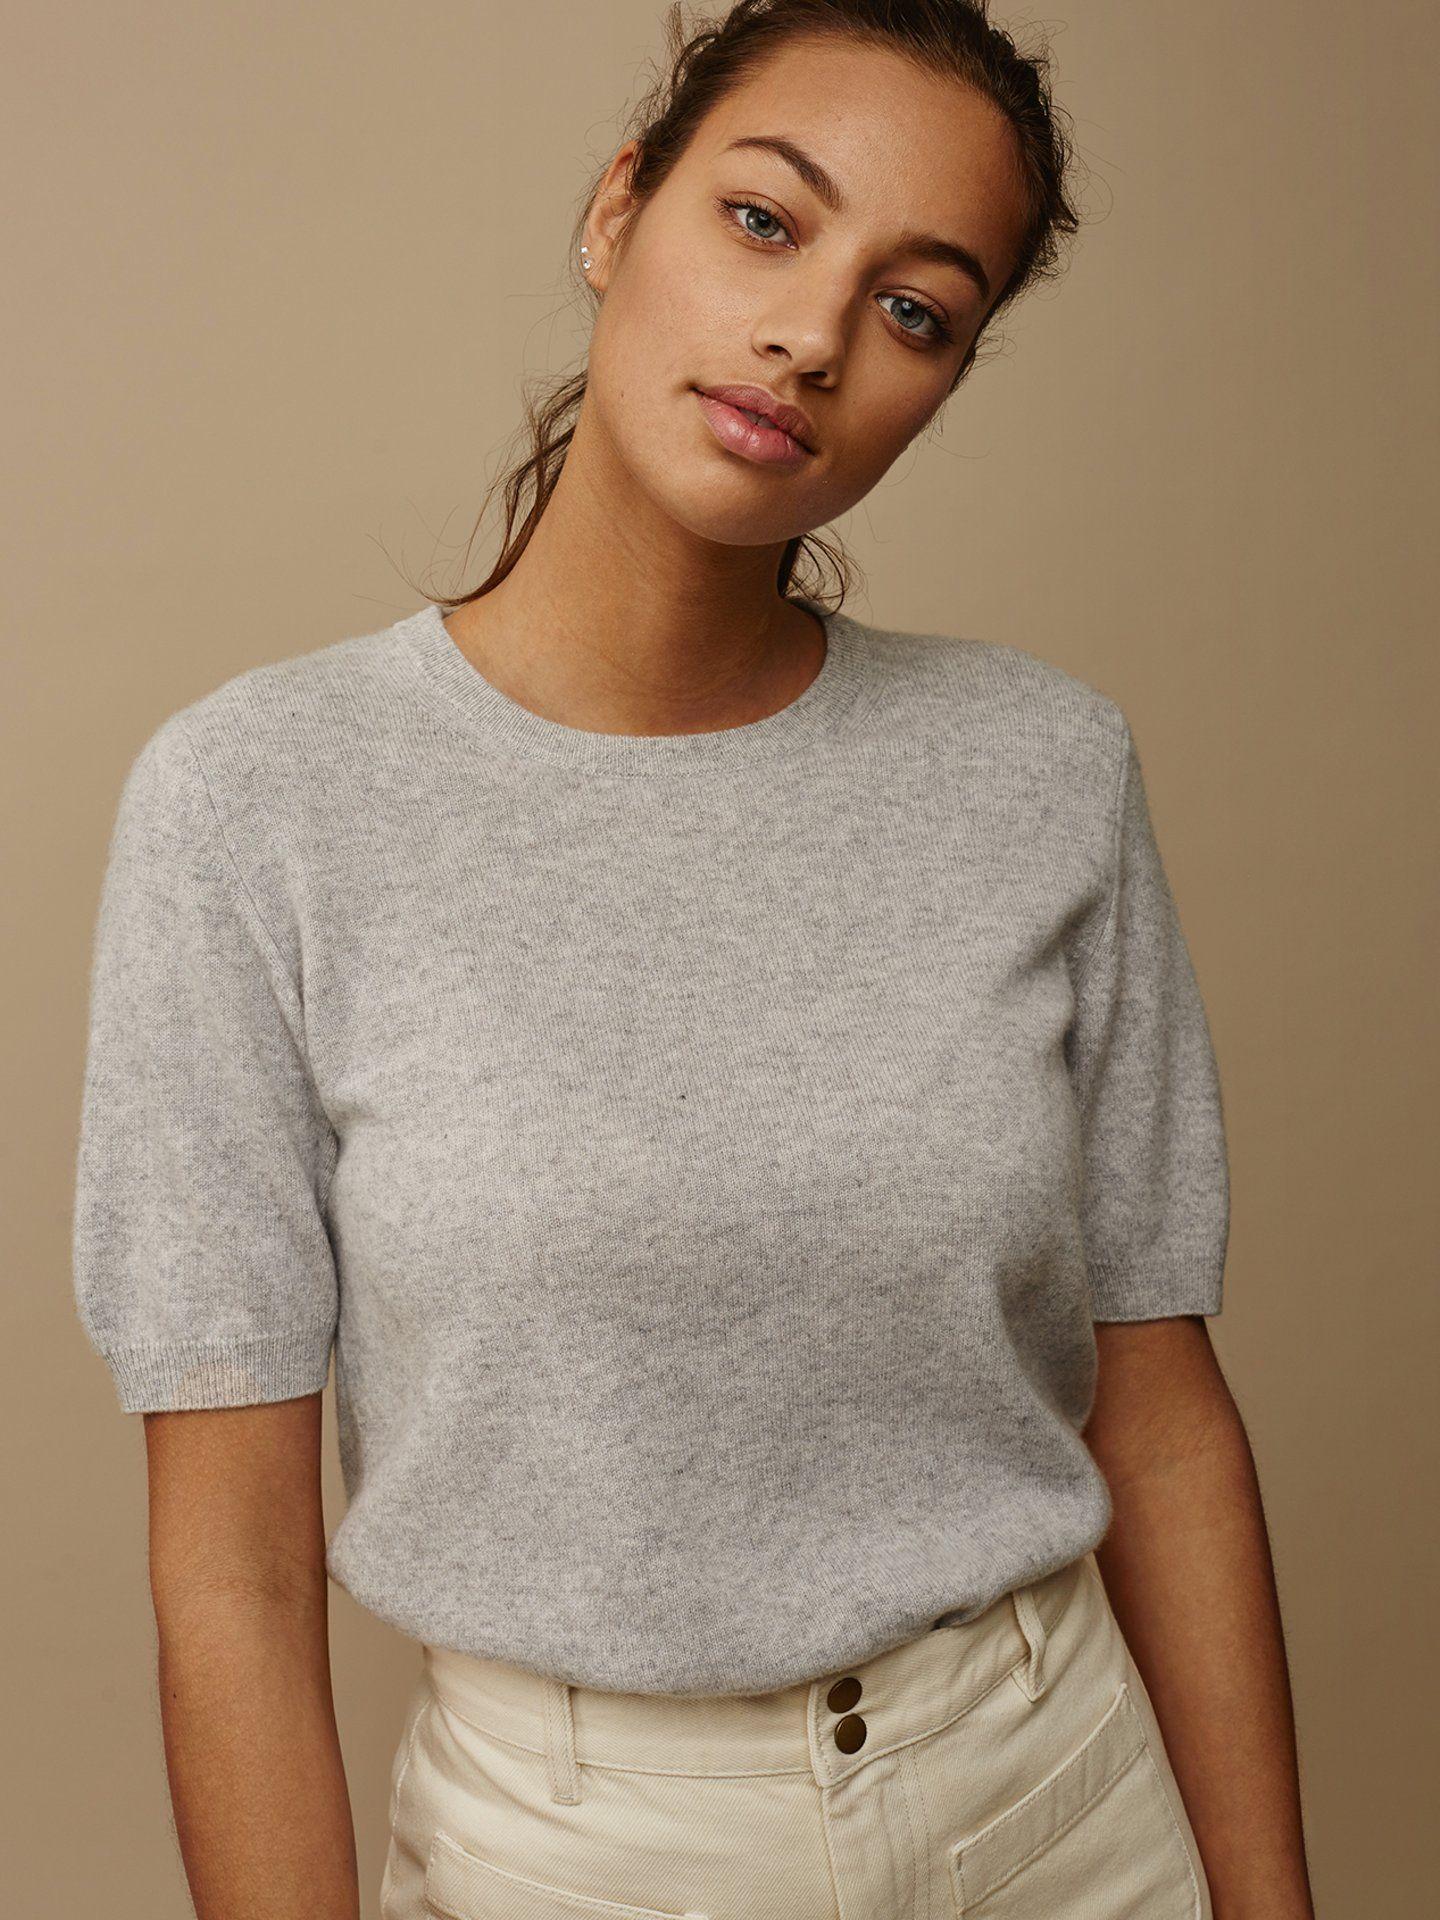 23e8bbd38 Women's Short Sleeve o-neck - Soft Goat - 100 % cashmere | Cashmere ...